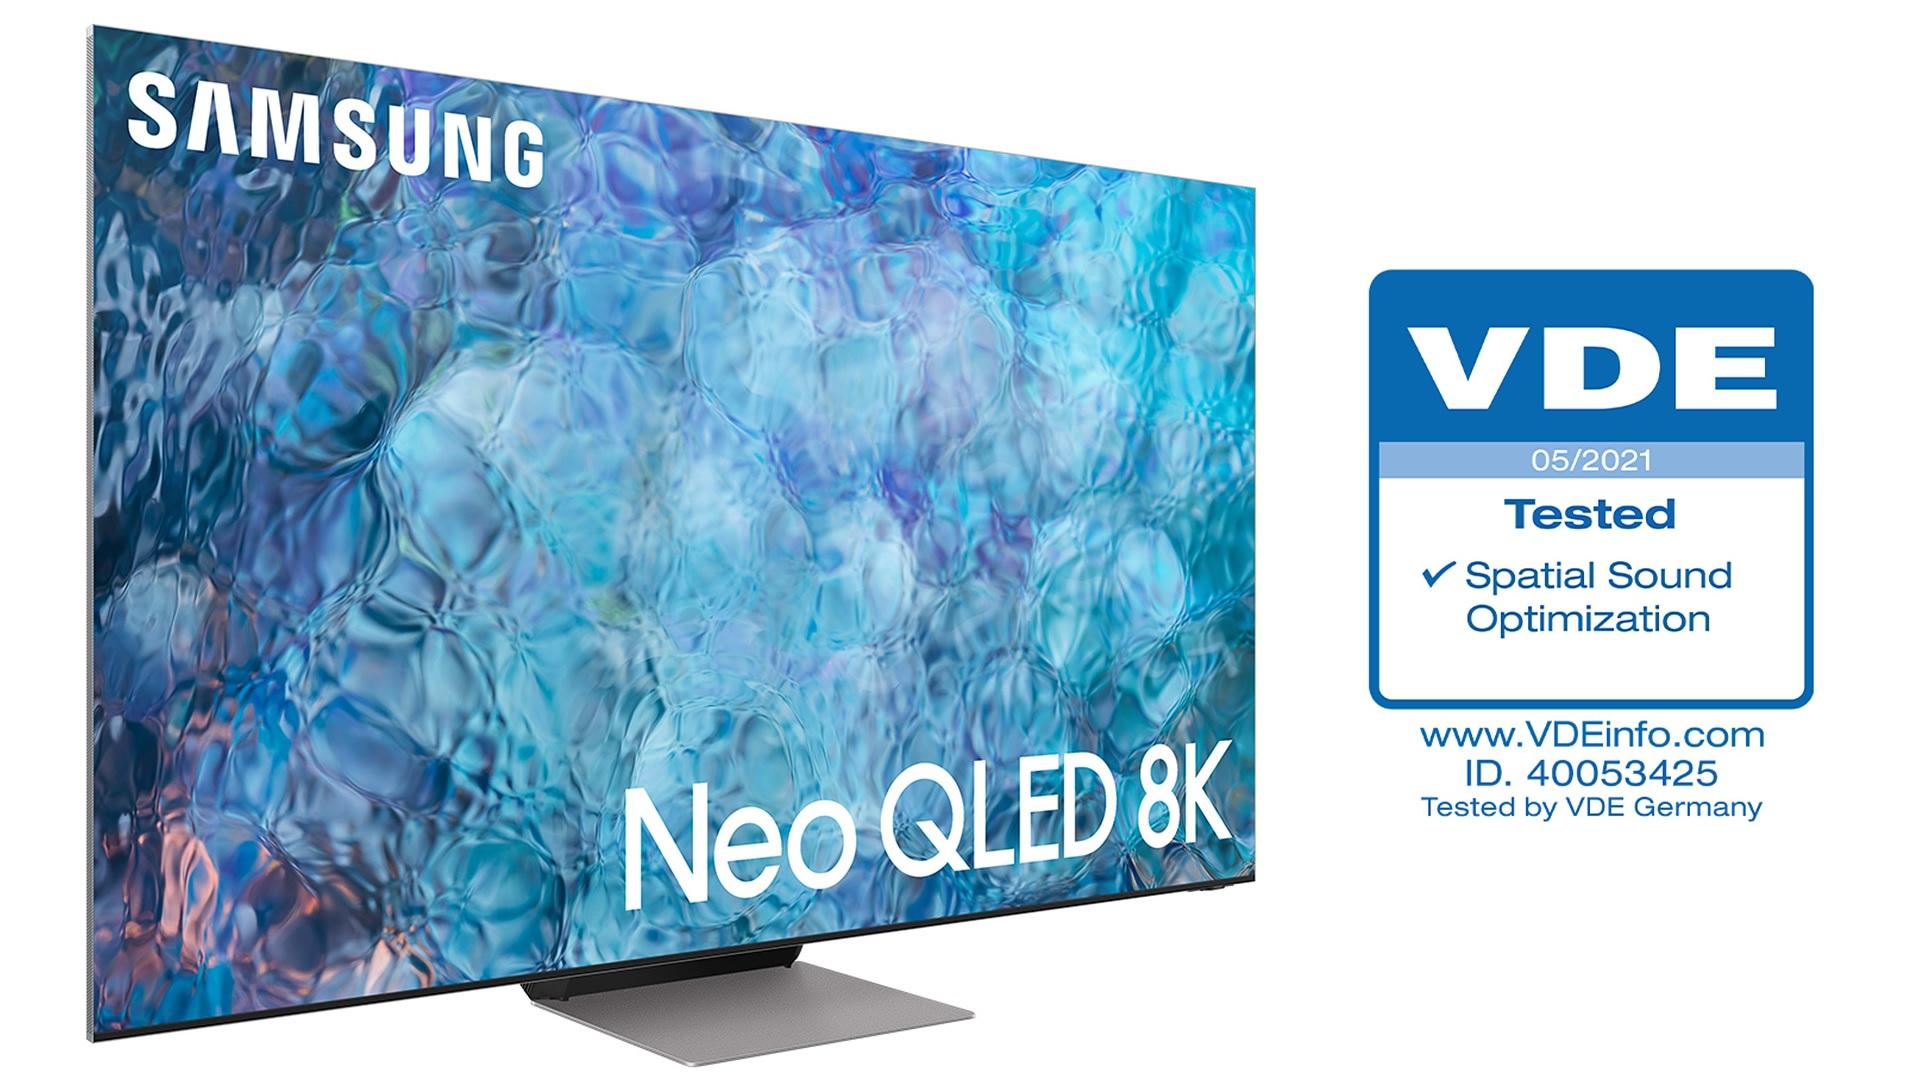 Samsung Neo QLED VDE Spatial Sound Optimization